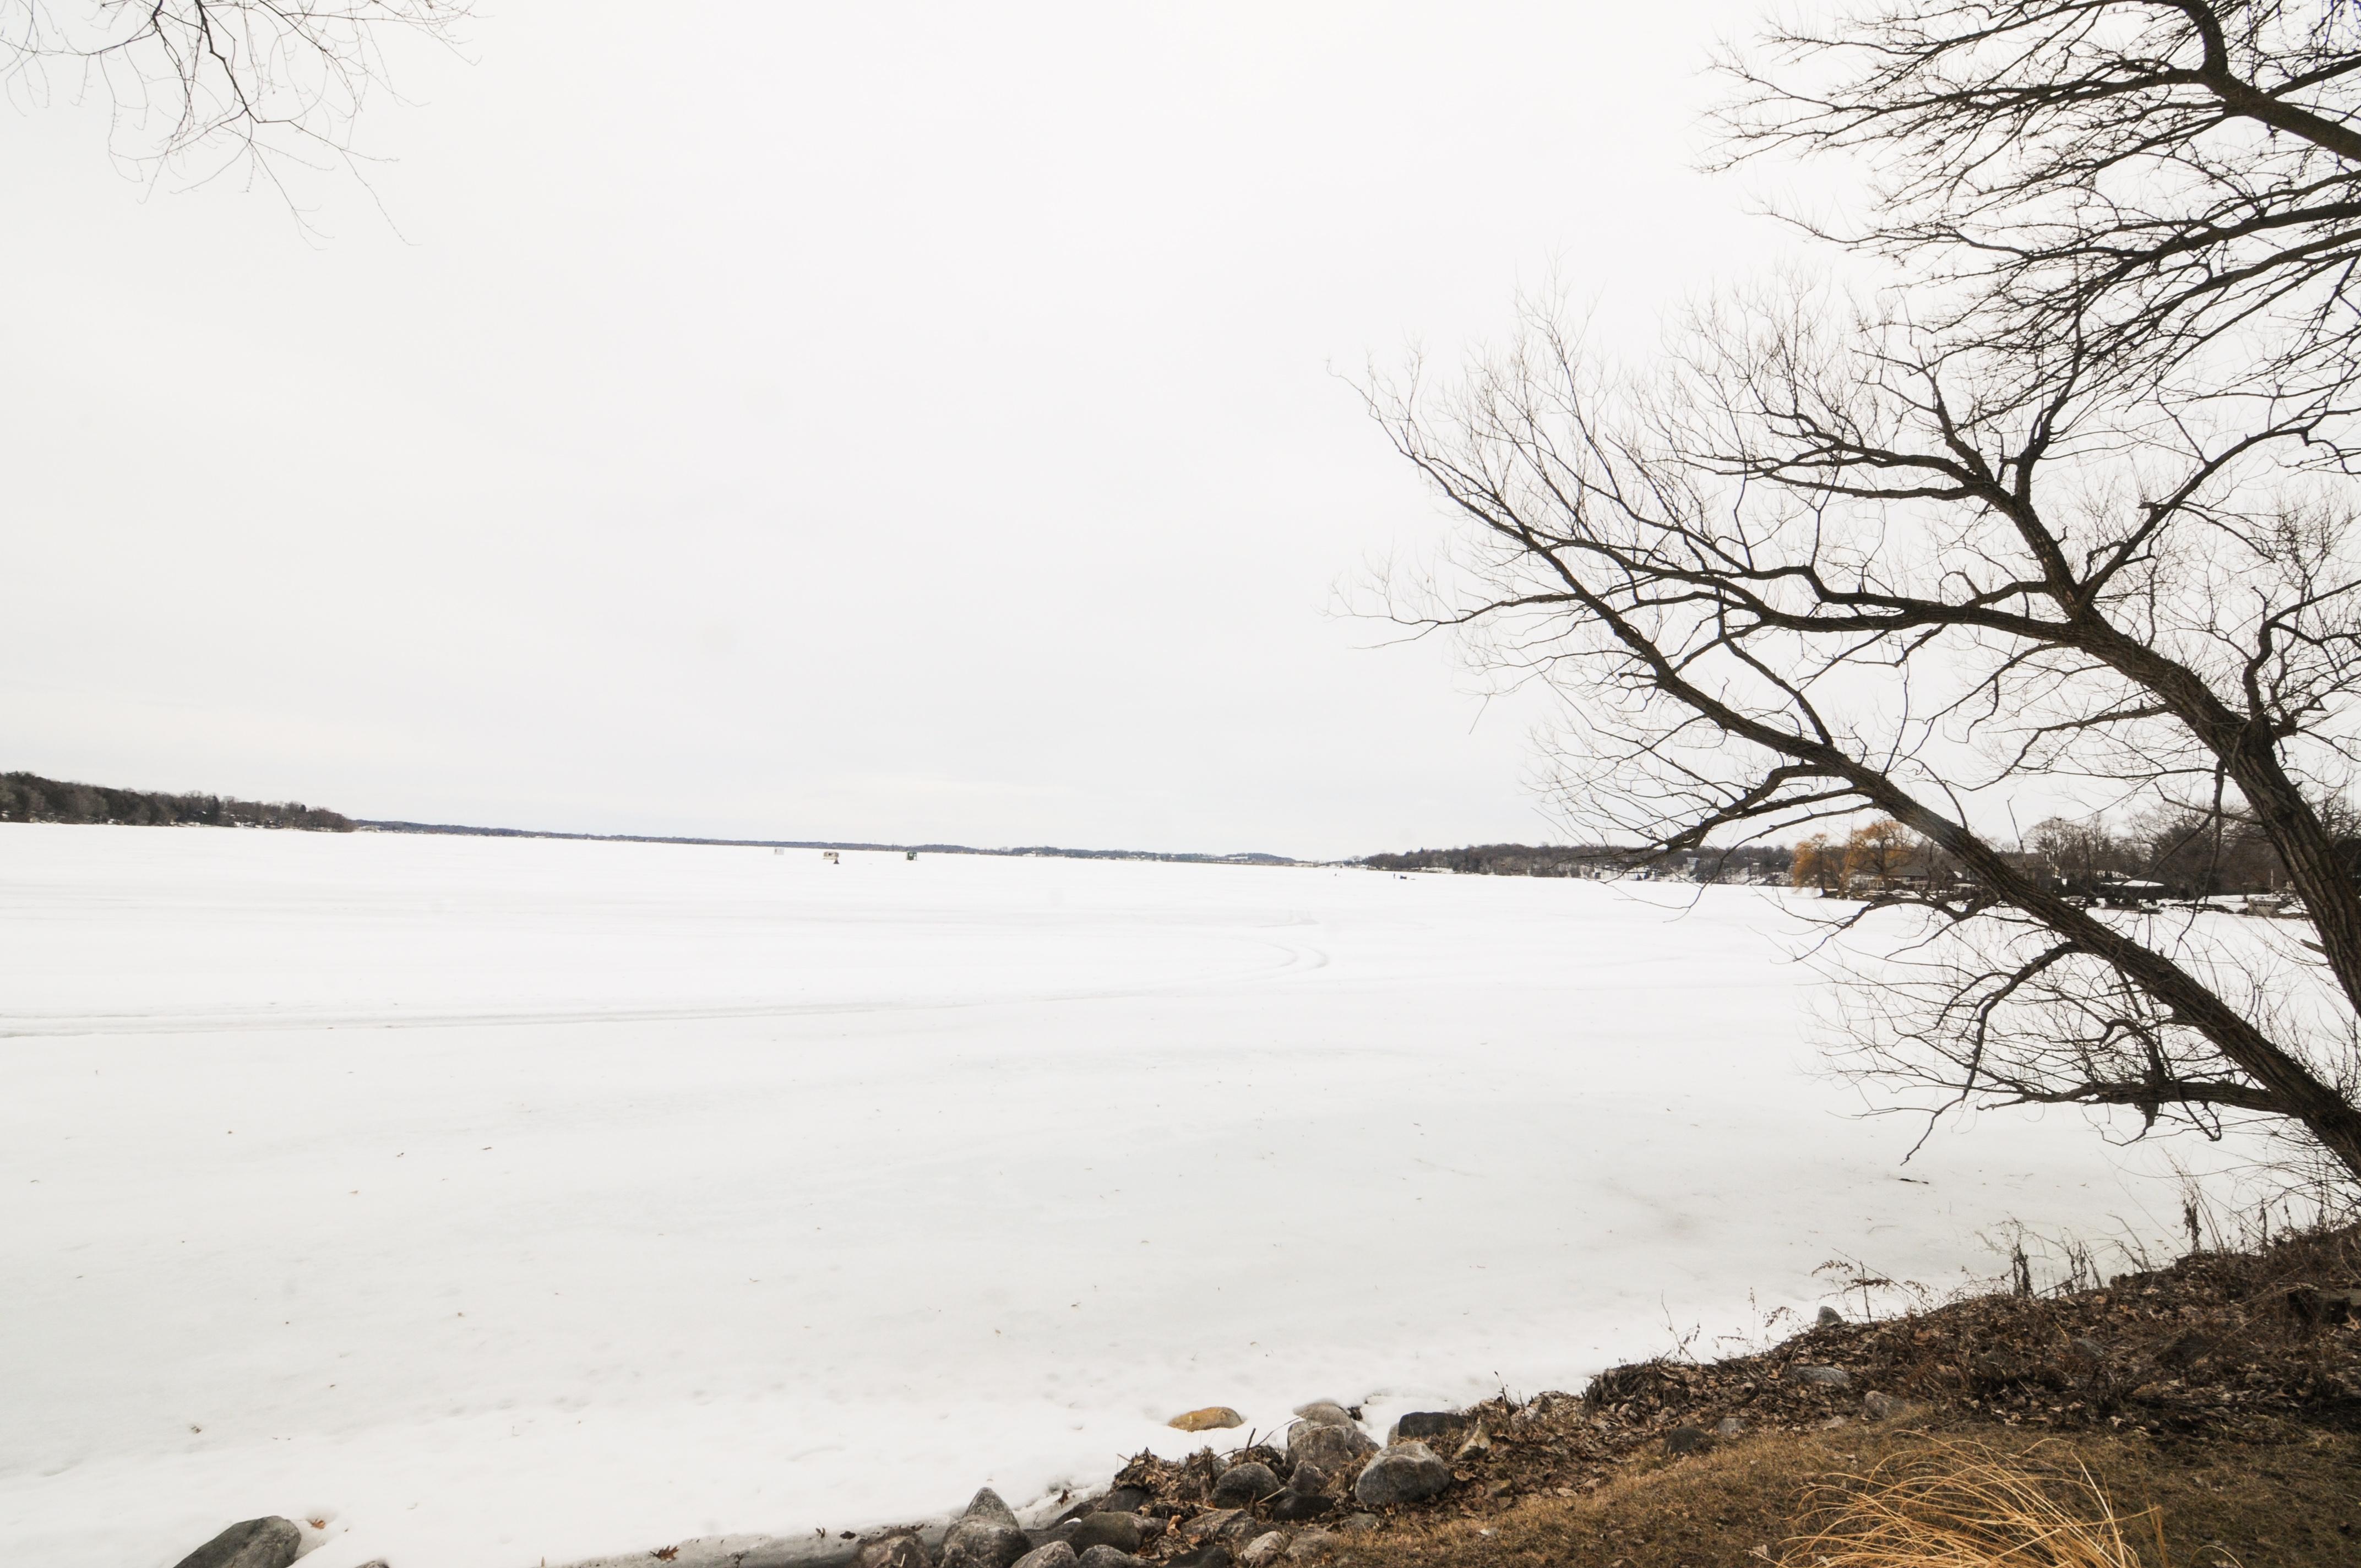 LakeMills5.jpg